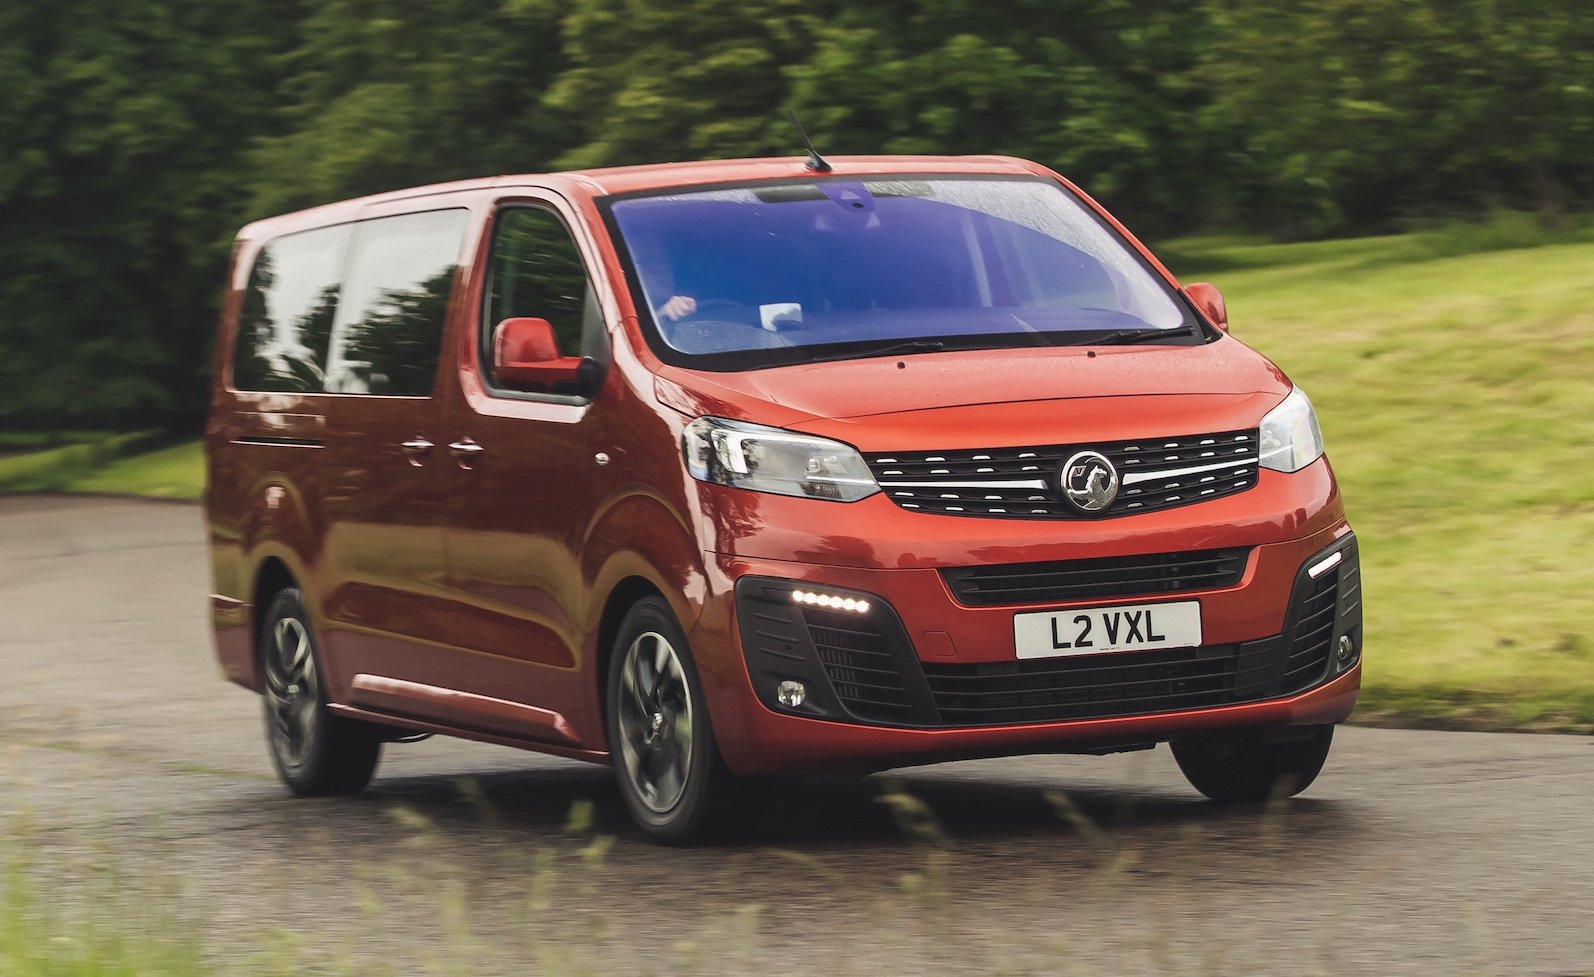 2019 Vauxhall Vivaro Life front